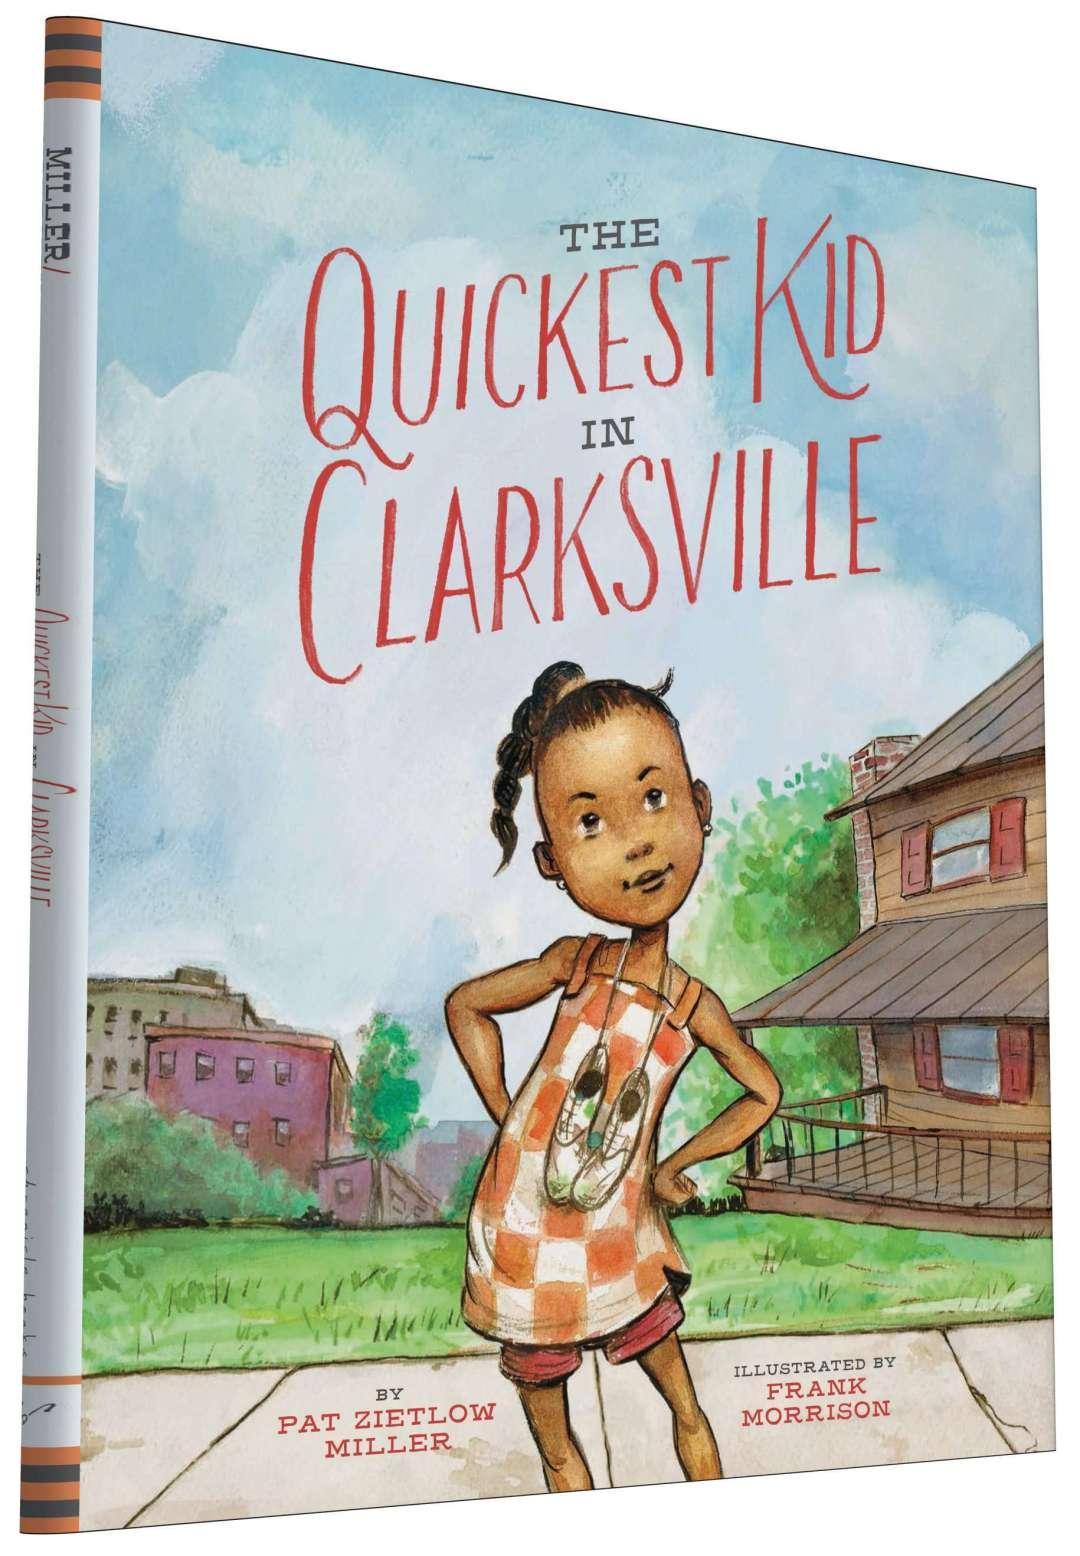 The Quickest kid in Clarksville. Book Review Vidya Sury